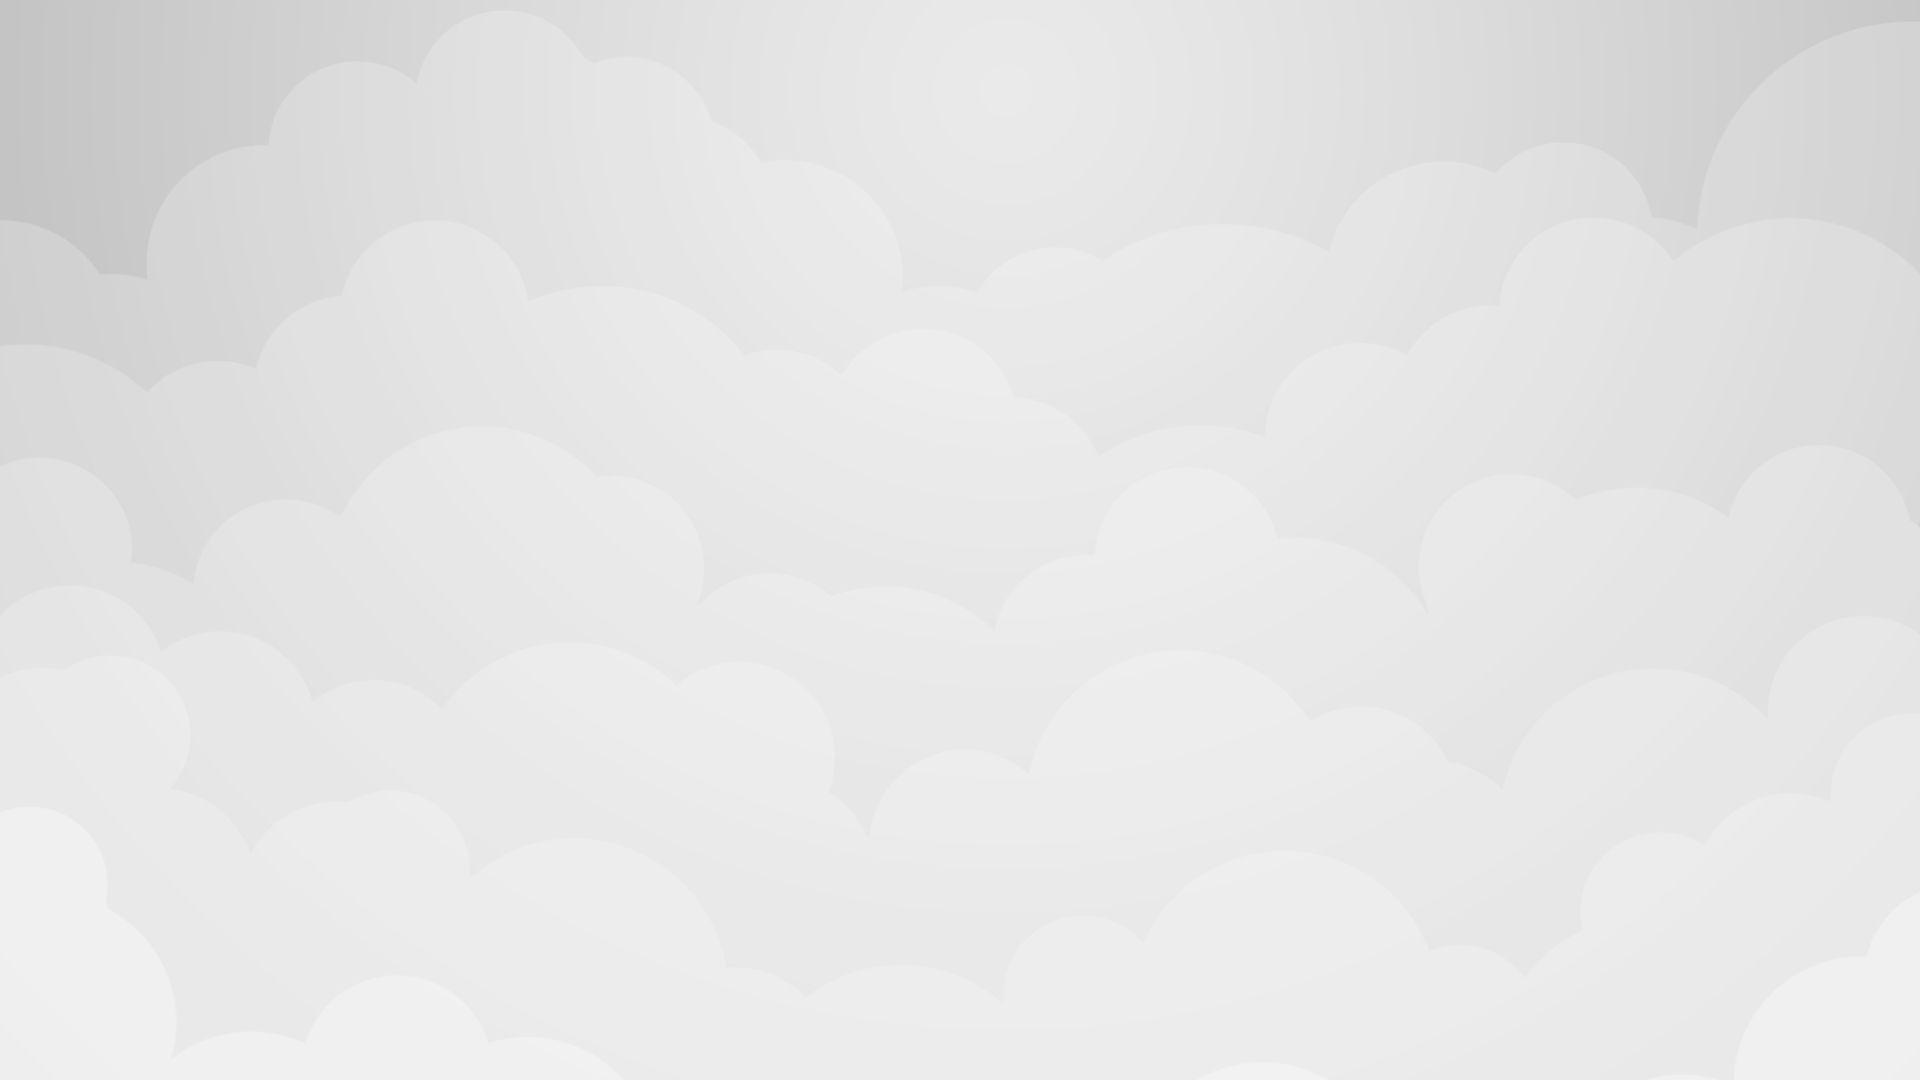 White Desktop Backgrounds 1920x1080